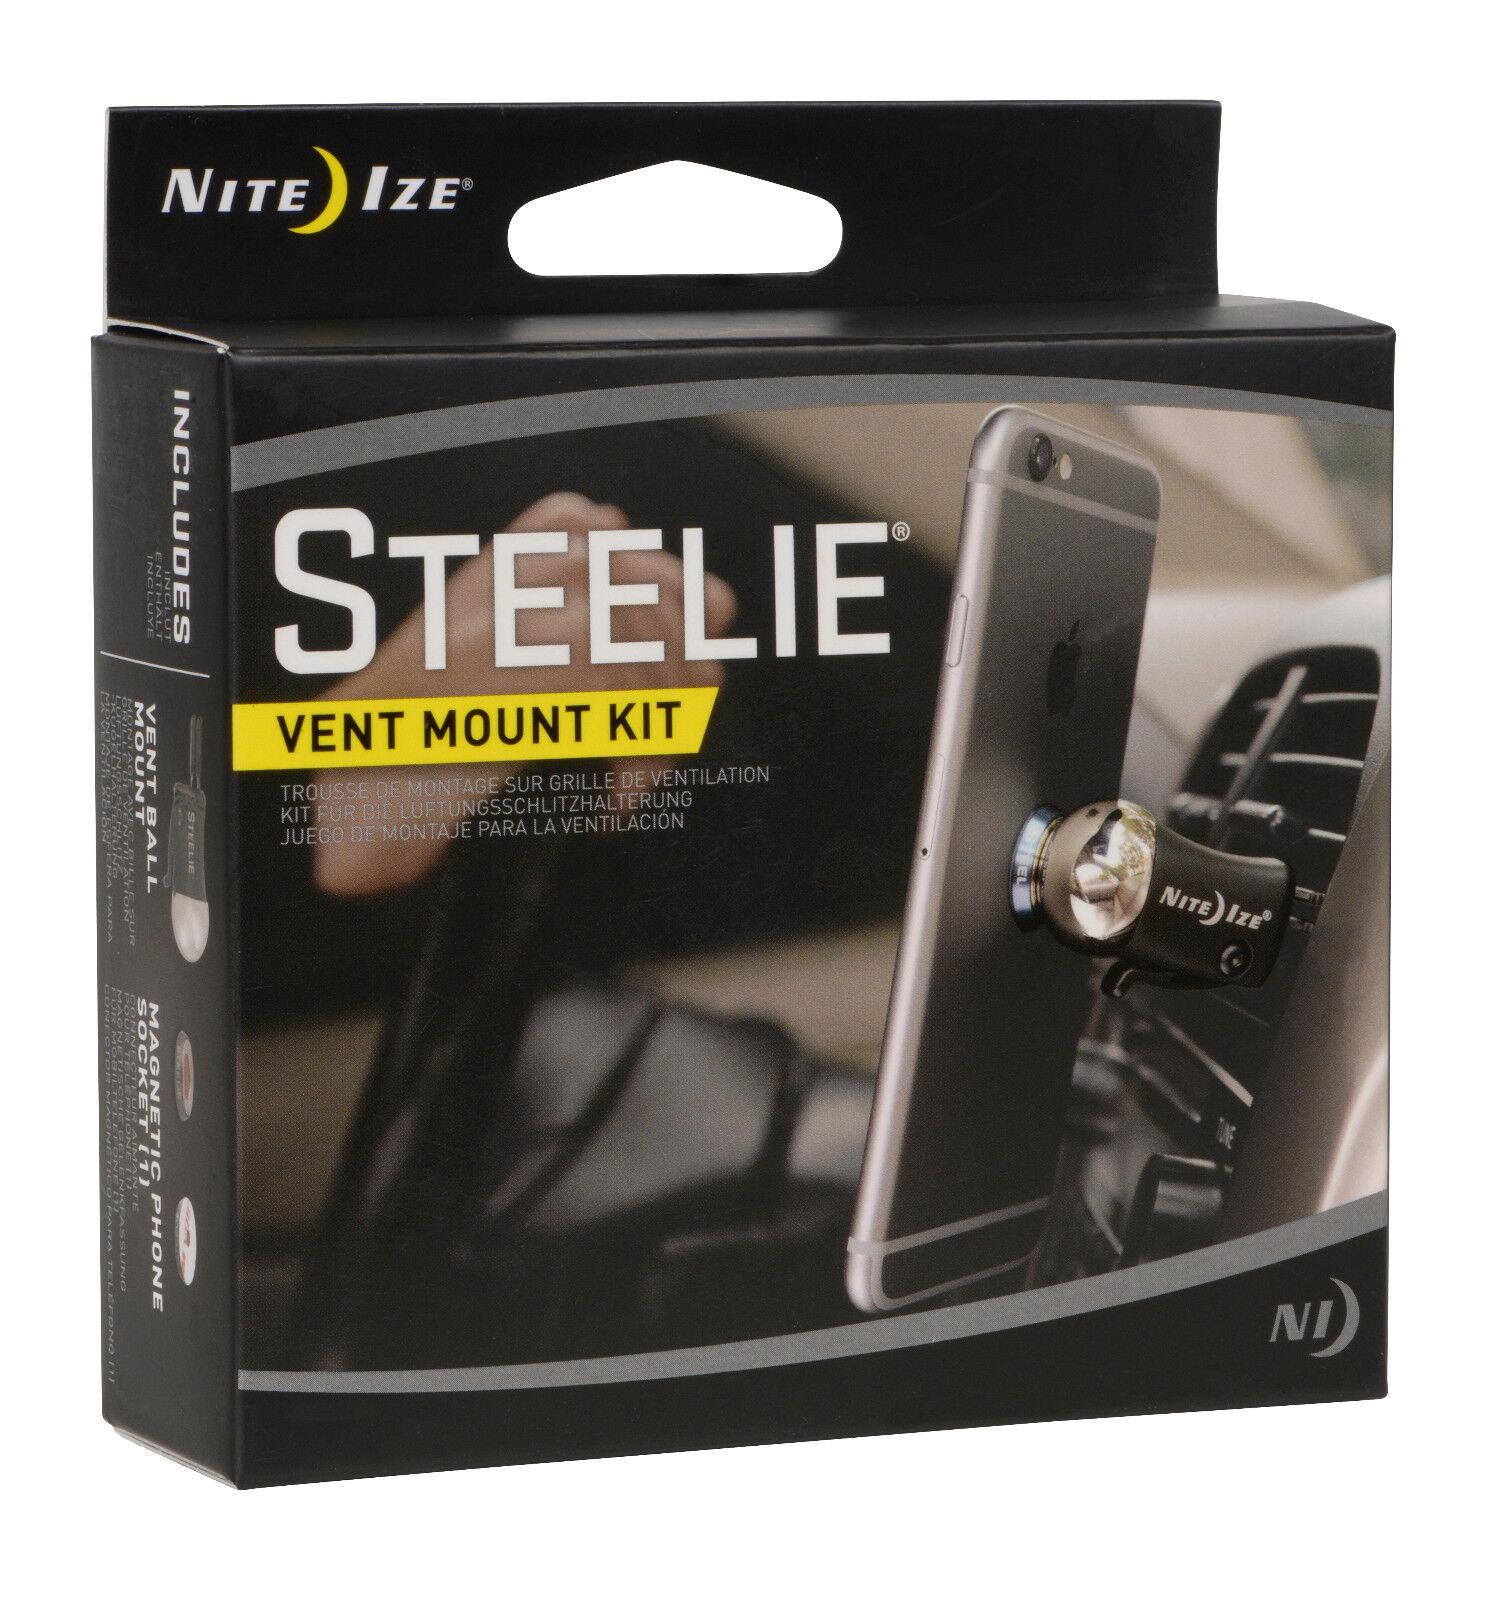 Nite Ize Steelie Vehicle Vent Car Mount Kit For Mobile Devices STVK-11-R8 NEW